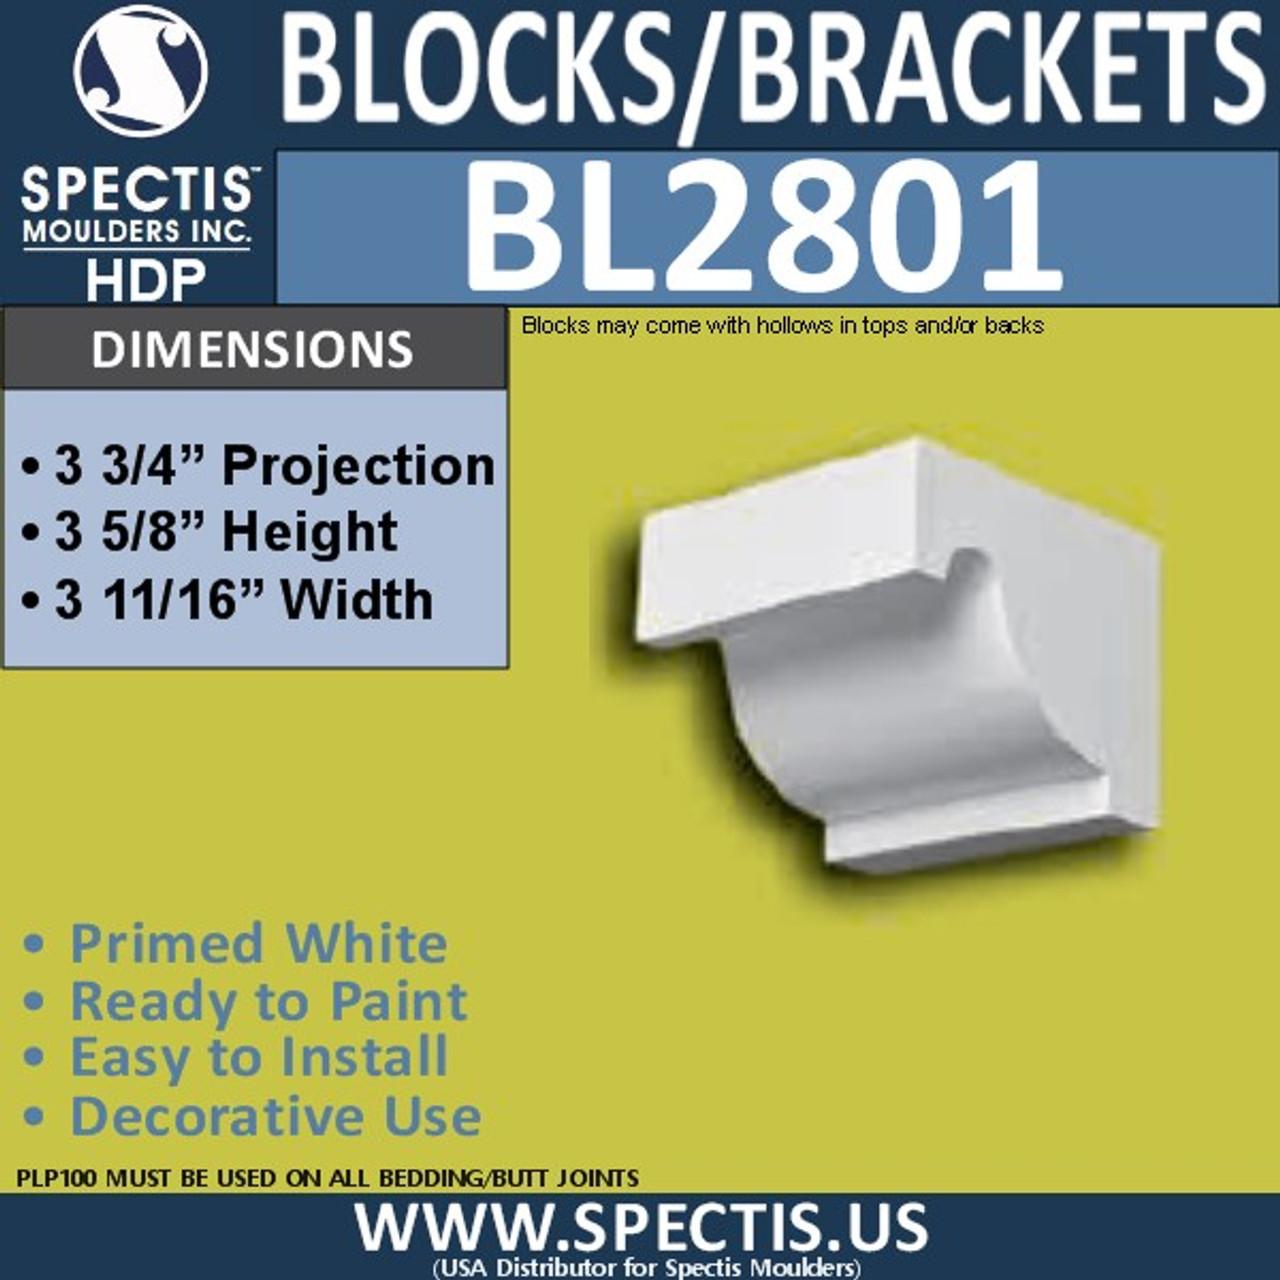 "BL2801 Eave Block or Bracket 3.75""W x 3.5""H x 3.75"" P"